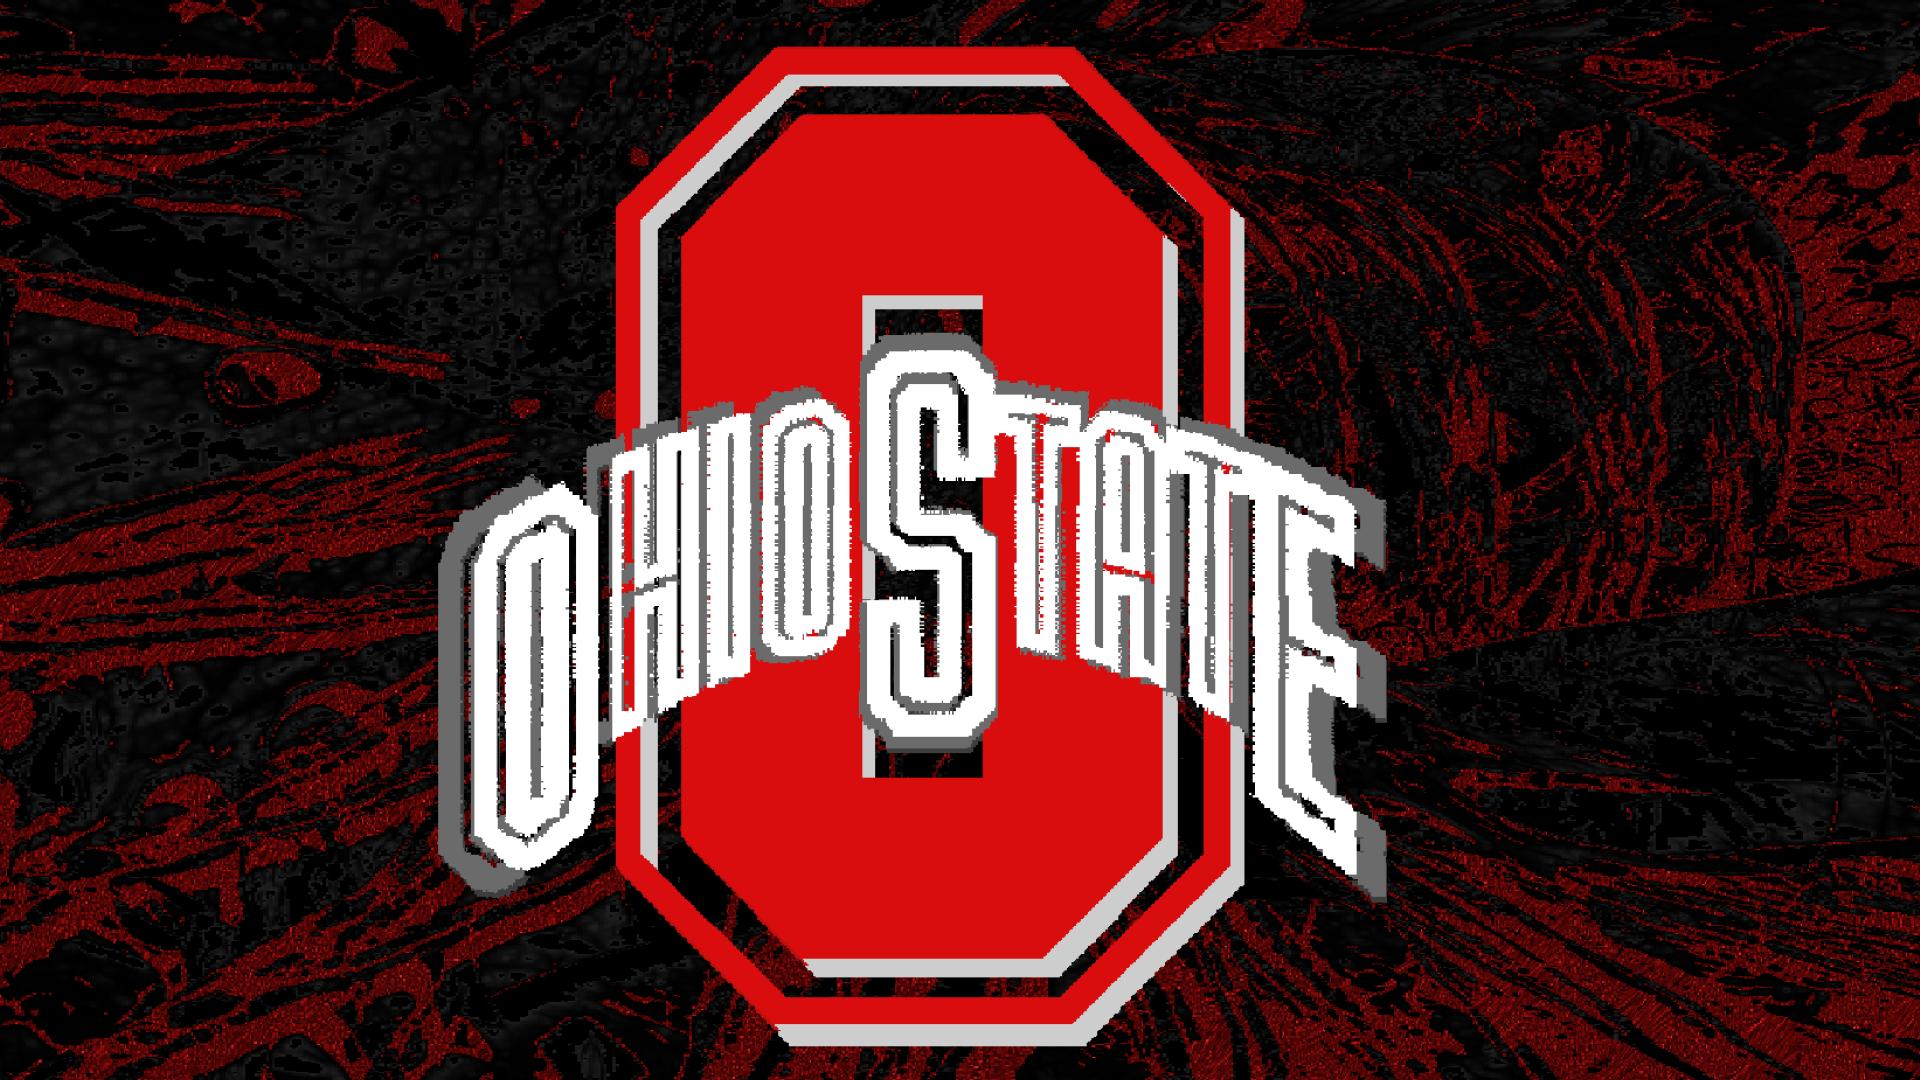 RED BLOCK O WHITE OHIO STATE WITH BUCKEYE LEAF - Ohio